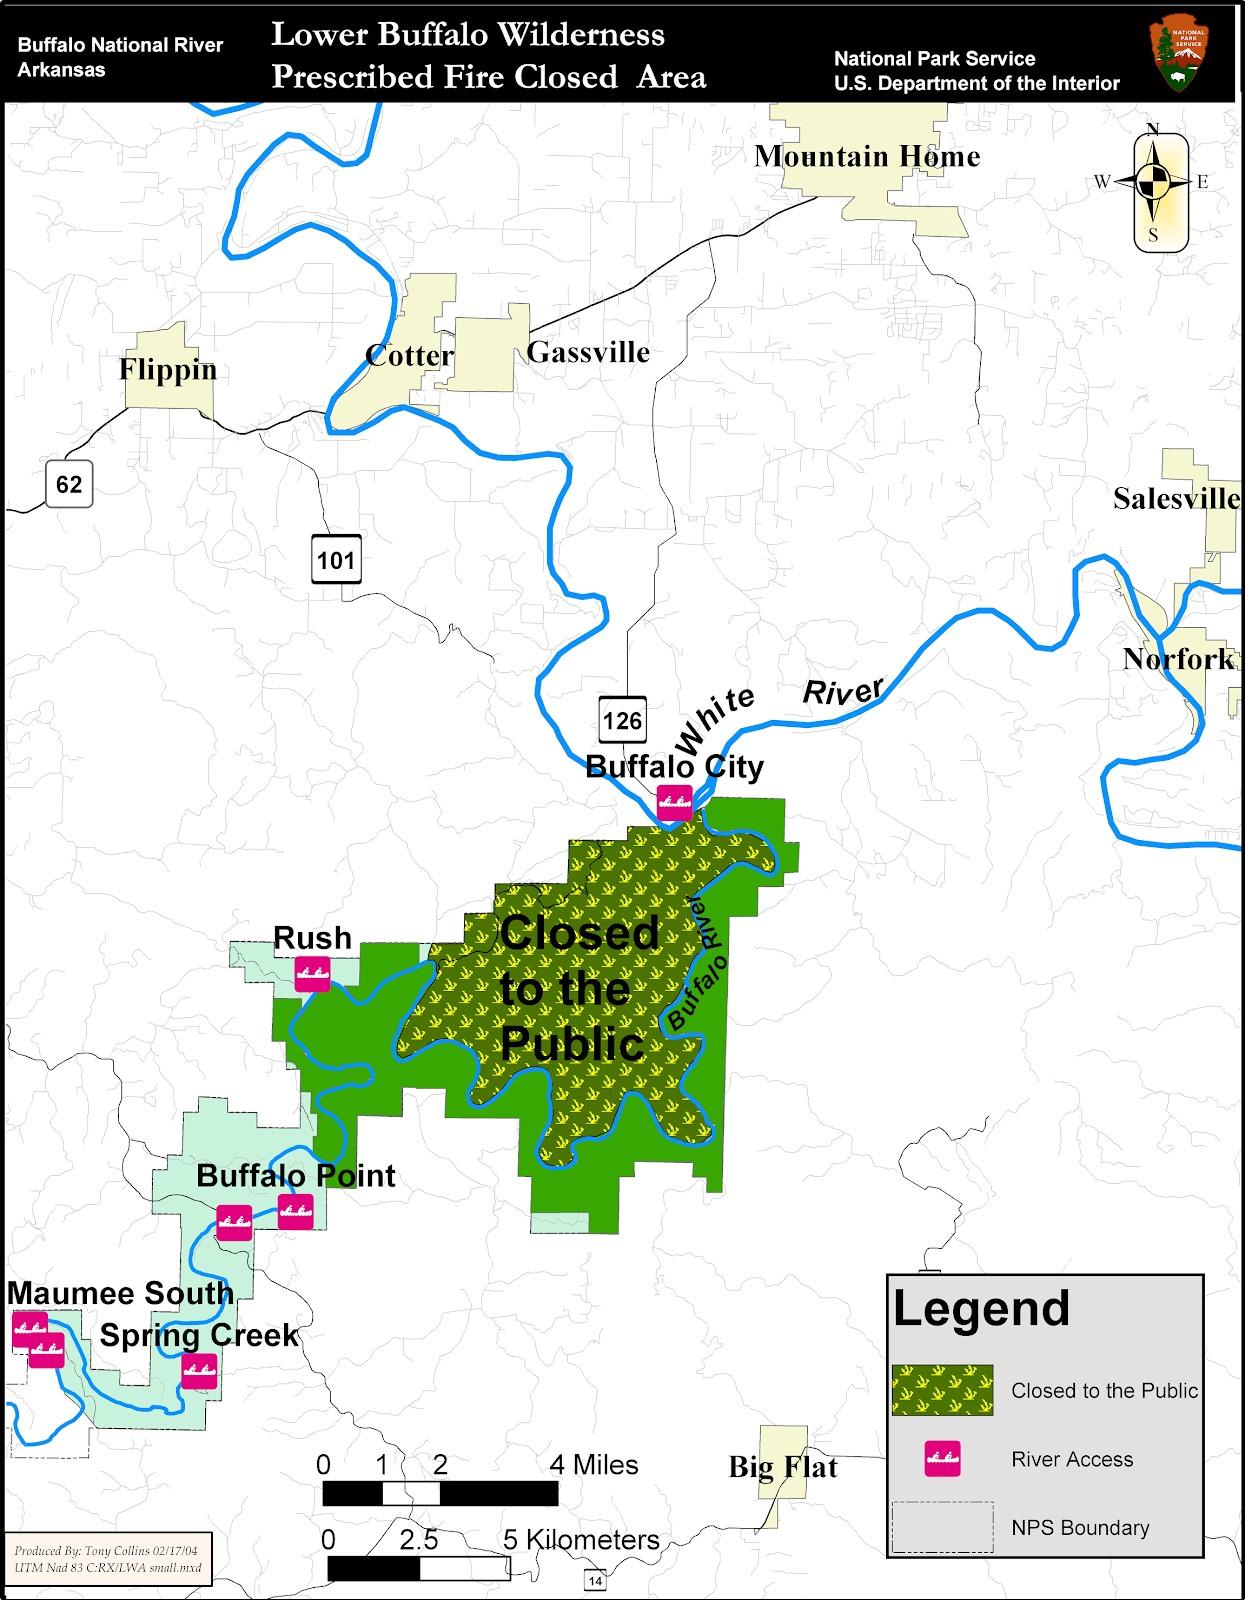 Closure Due To Prescribed Fire At Buffalo National River Buffalo